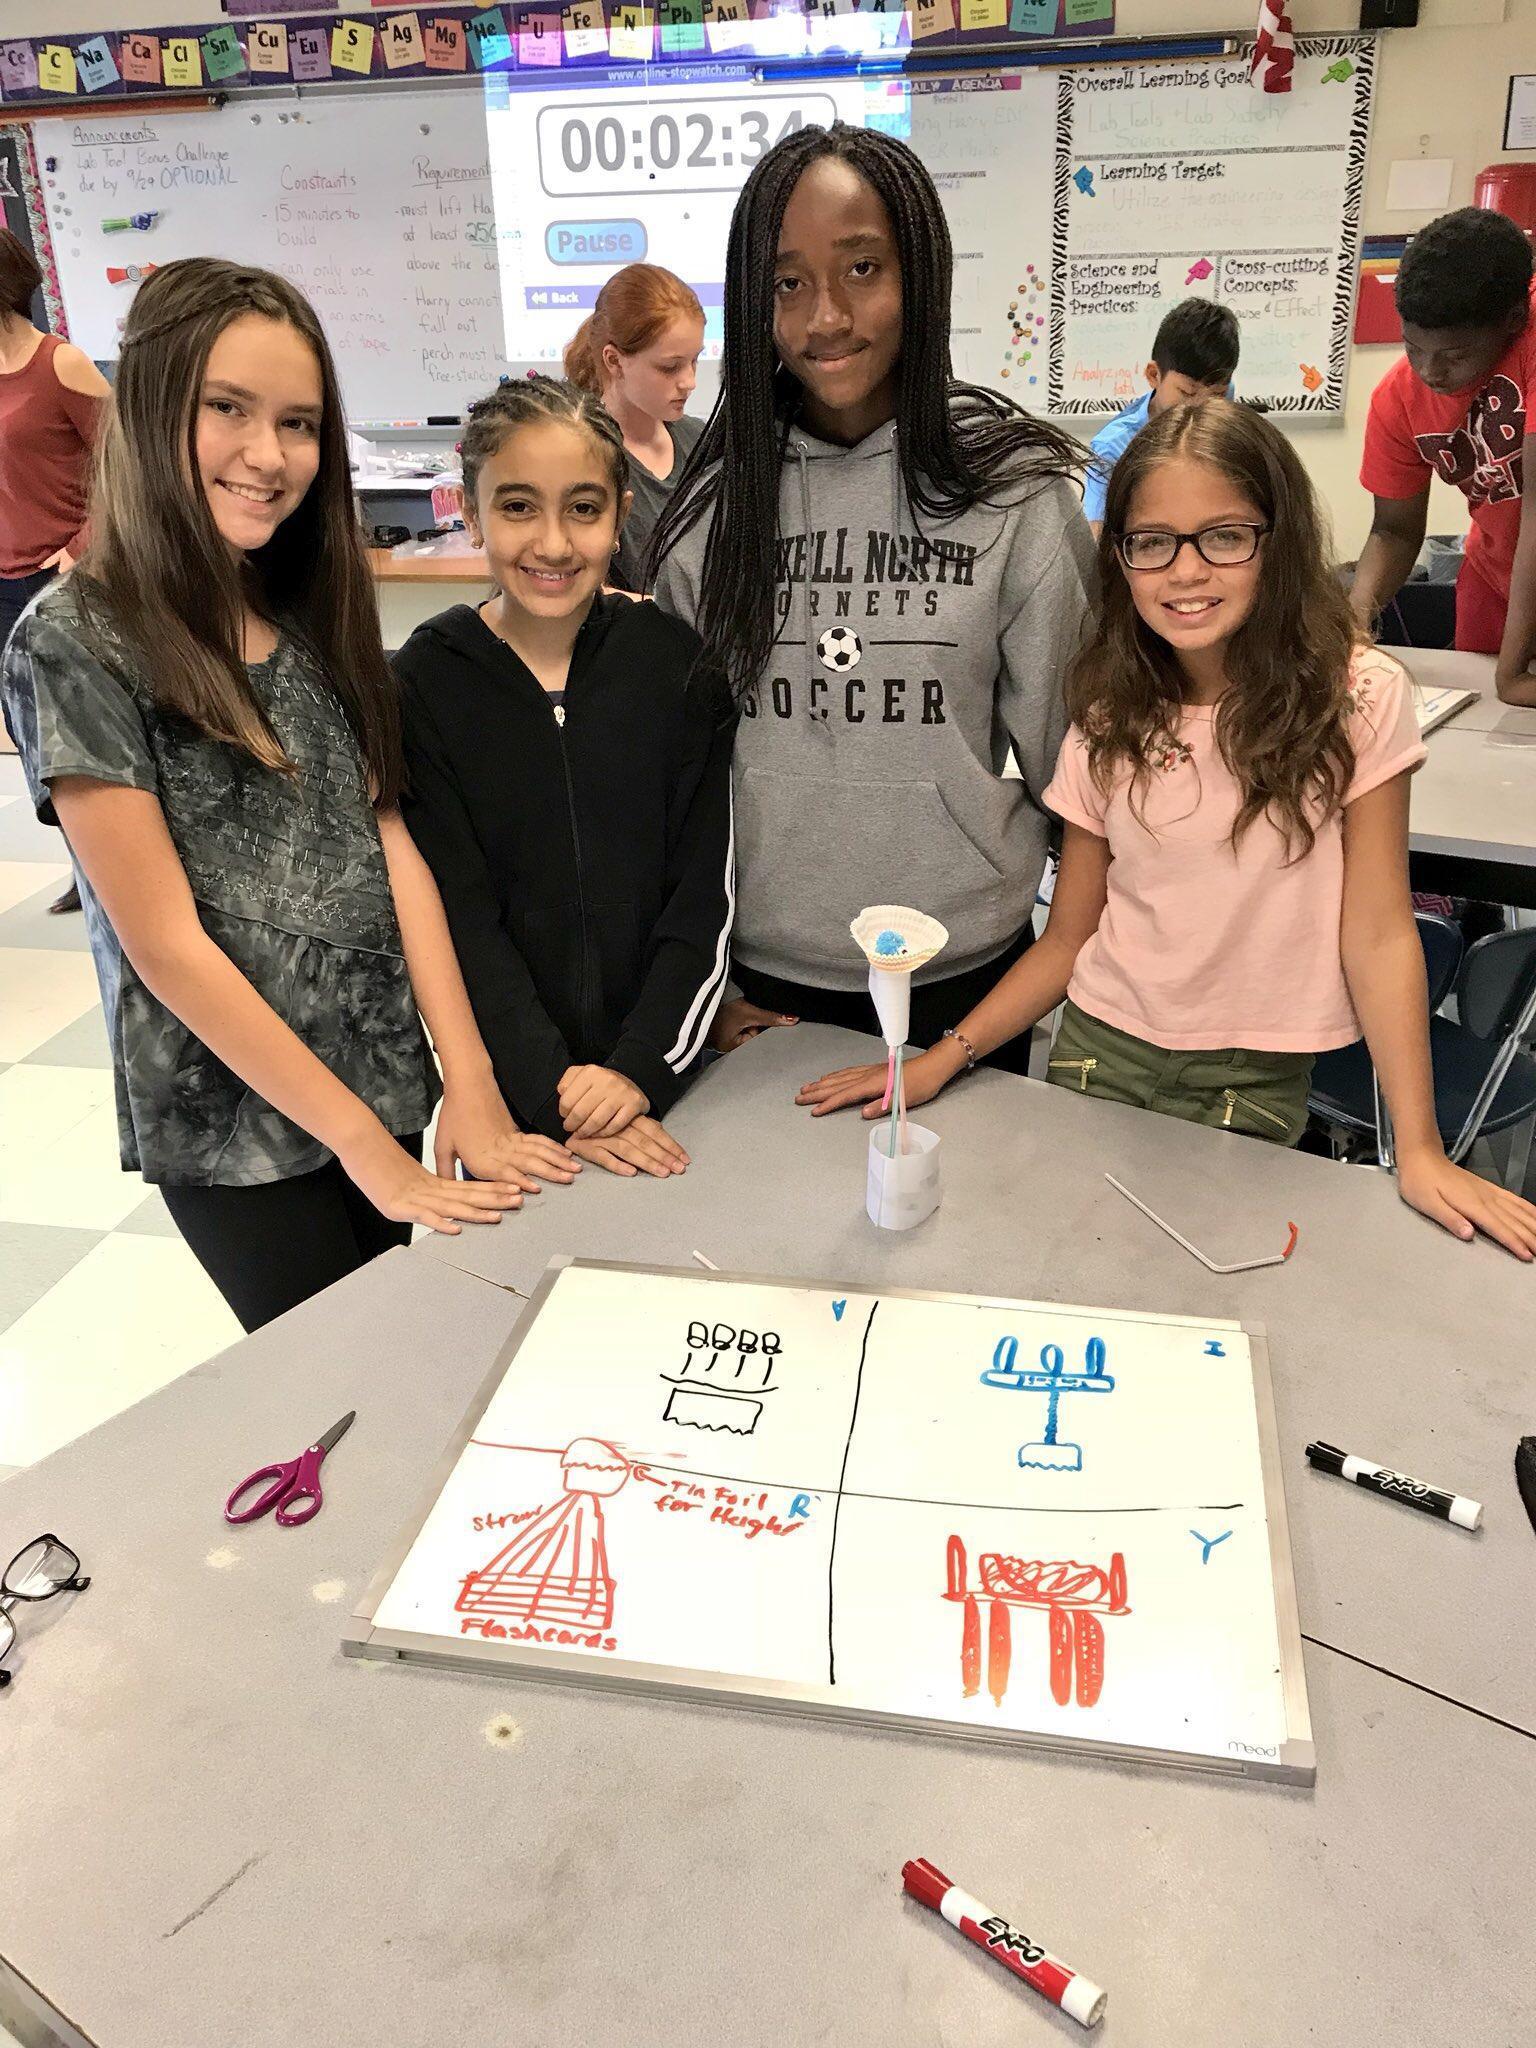 Students Engineering